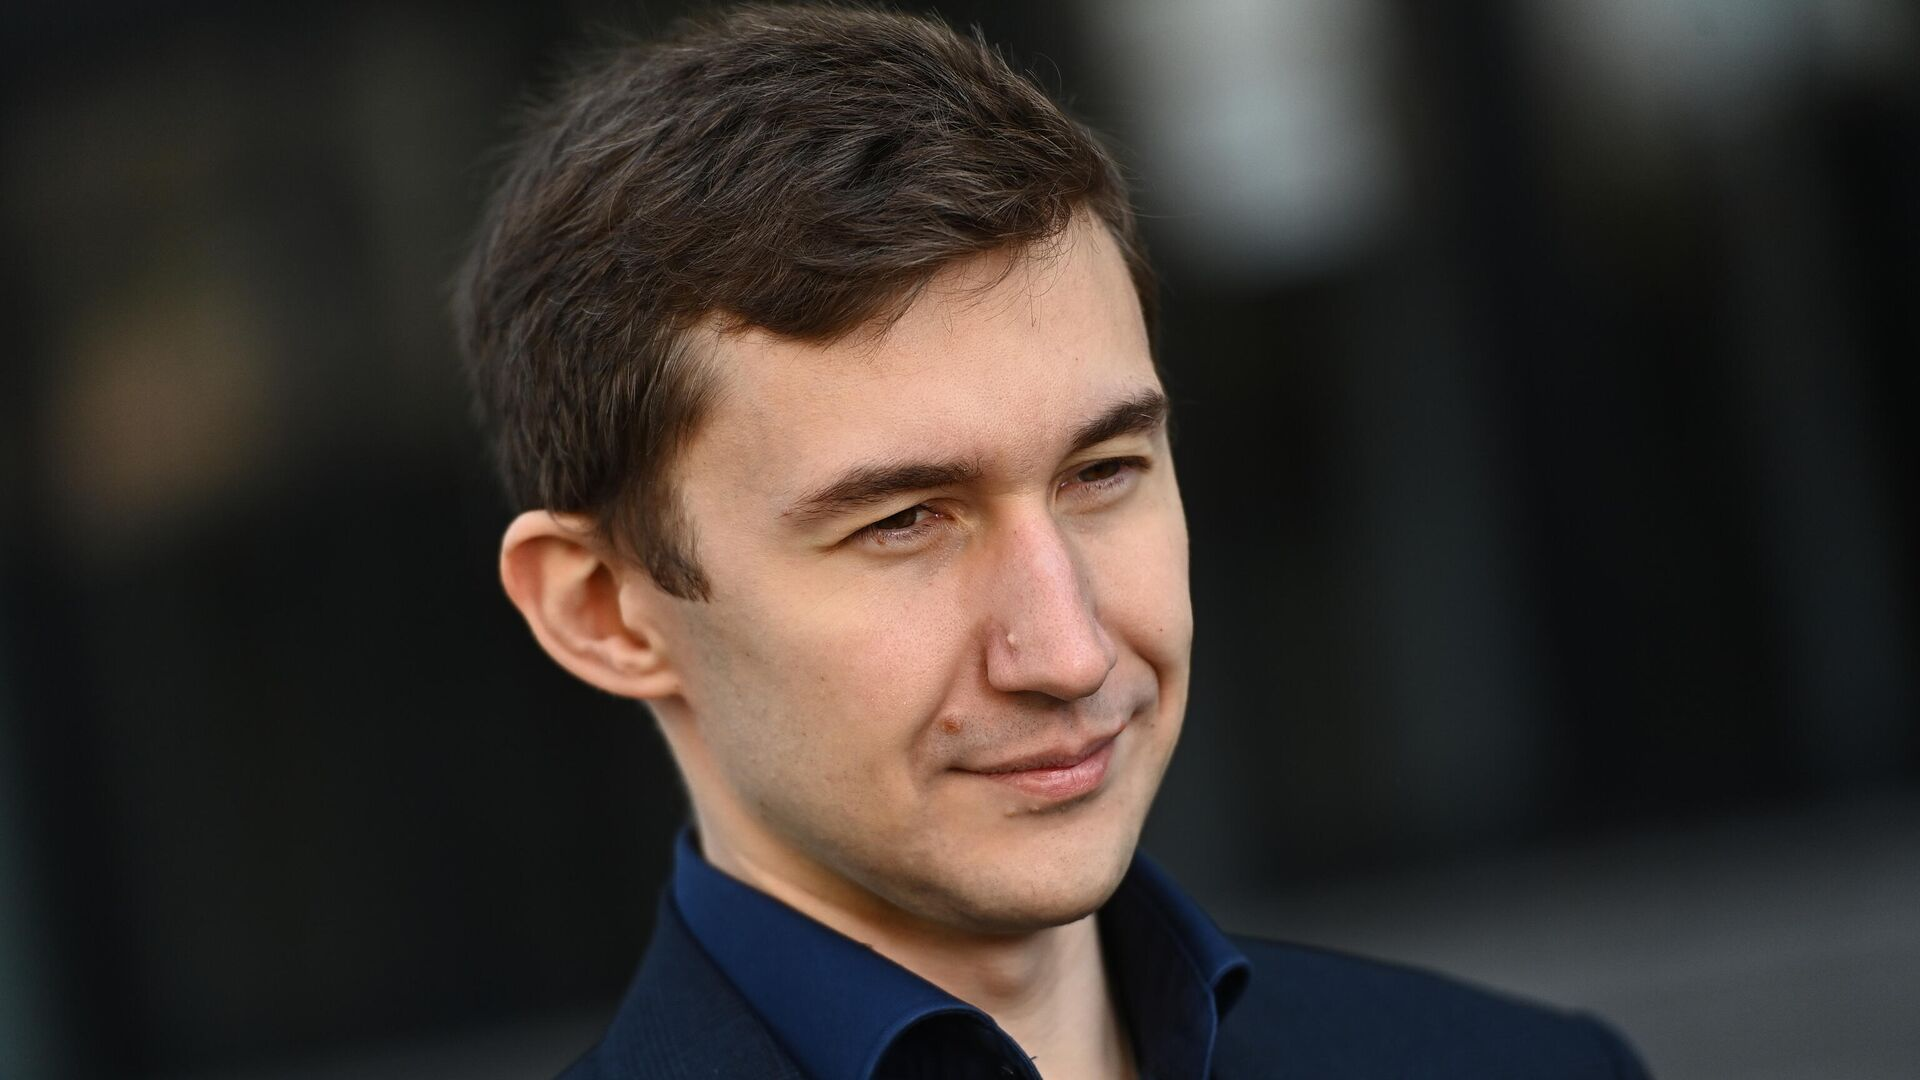 Турнир претендентов по шахматам возобновится с 19 апреля - РИА Новости, 1920, 30.07.2021